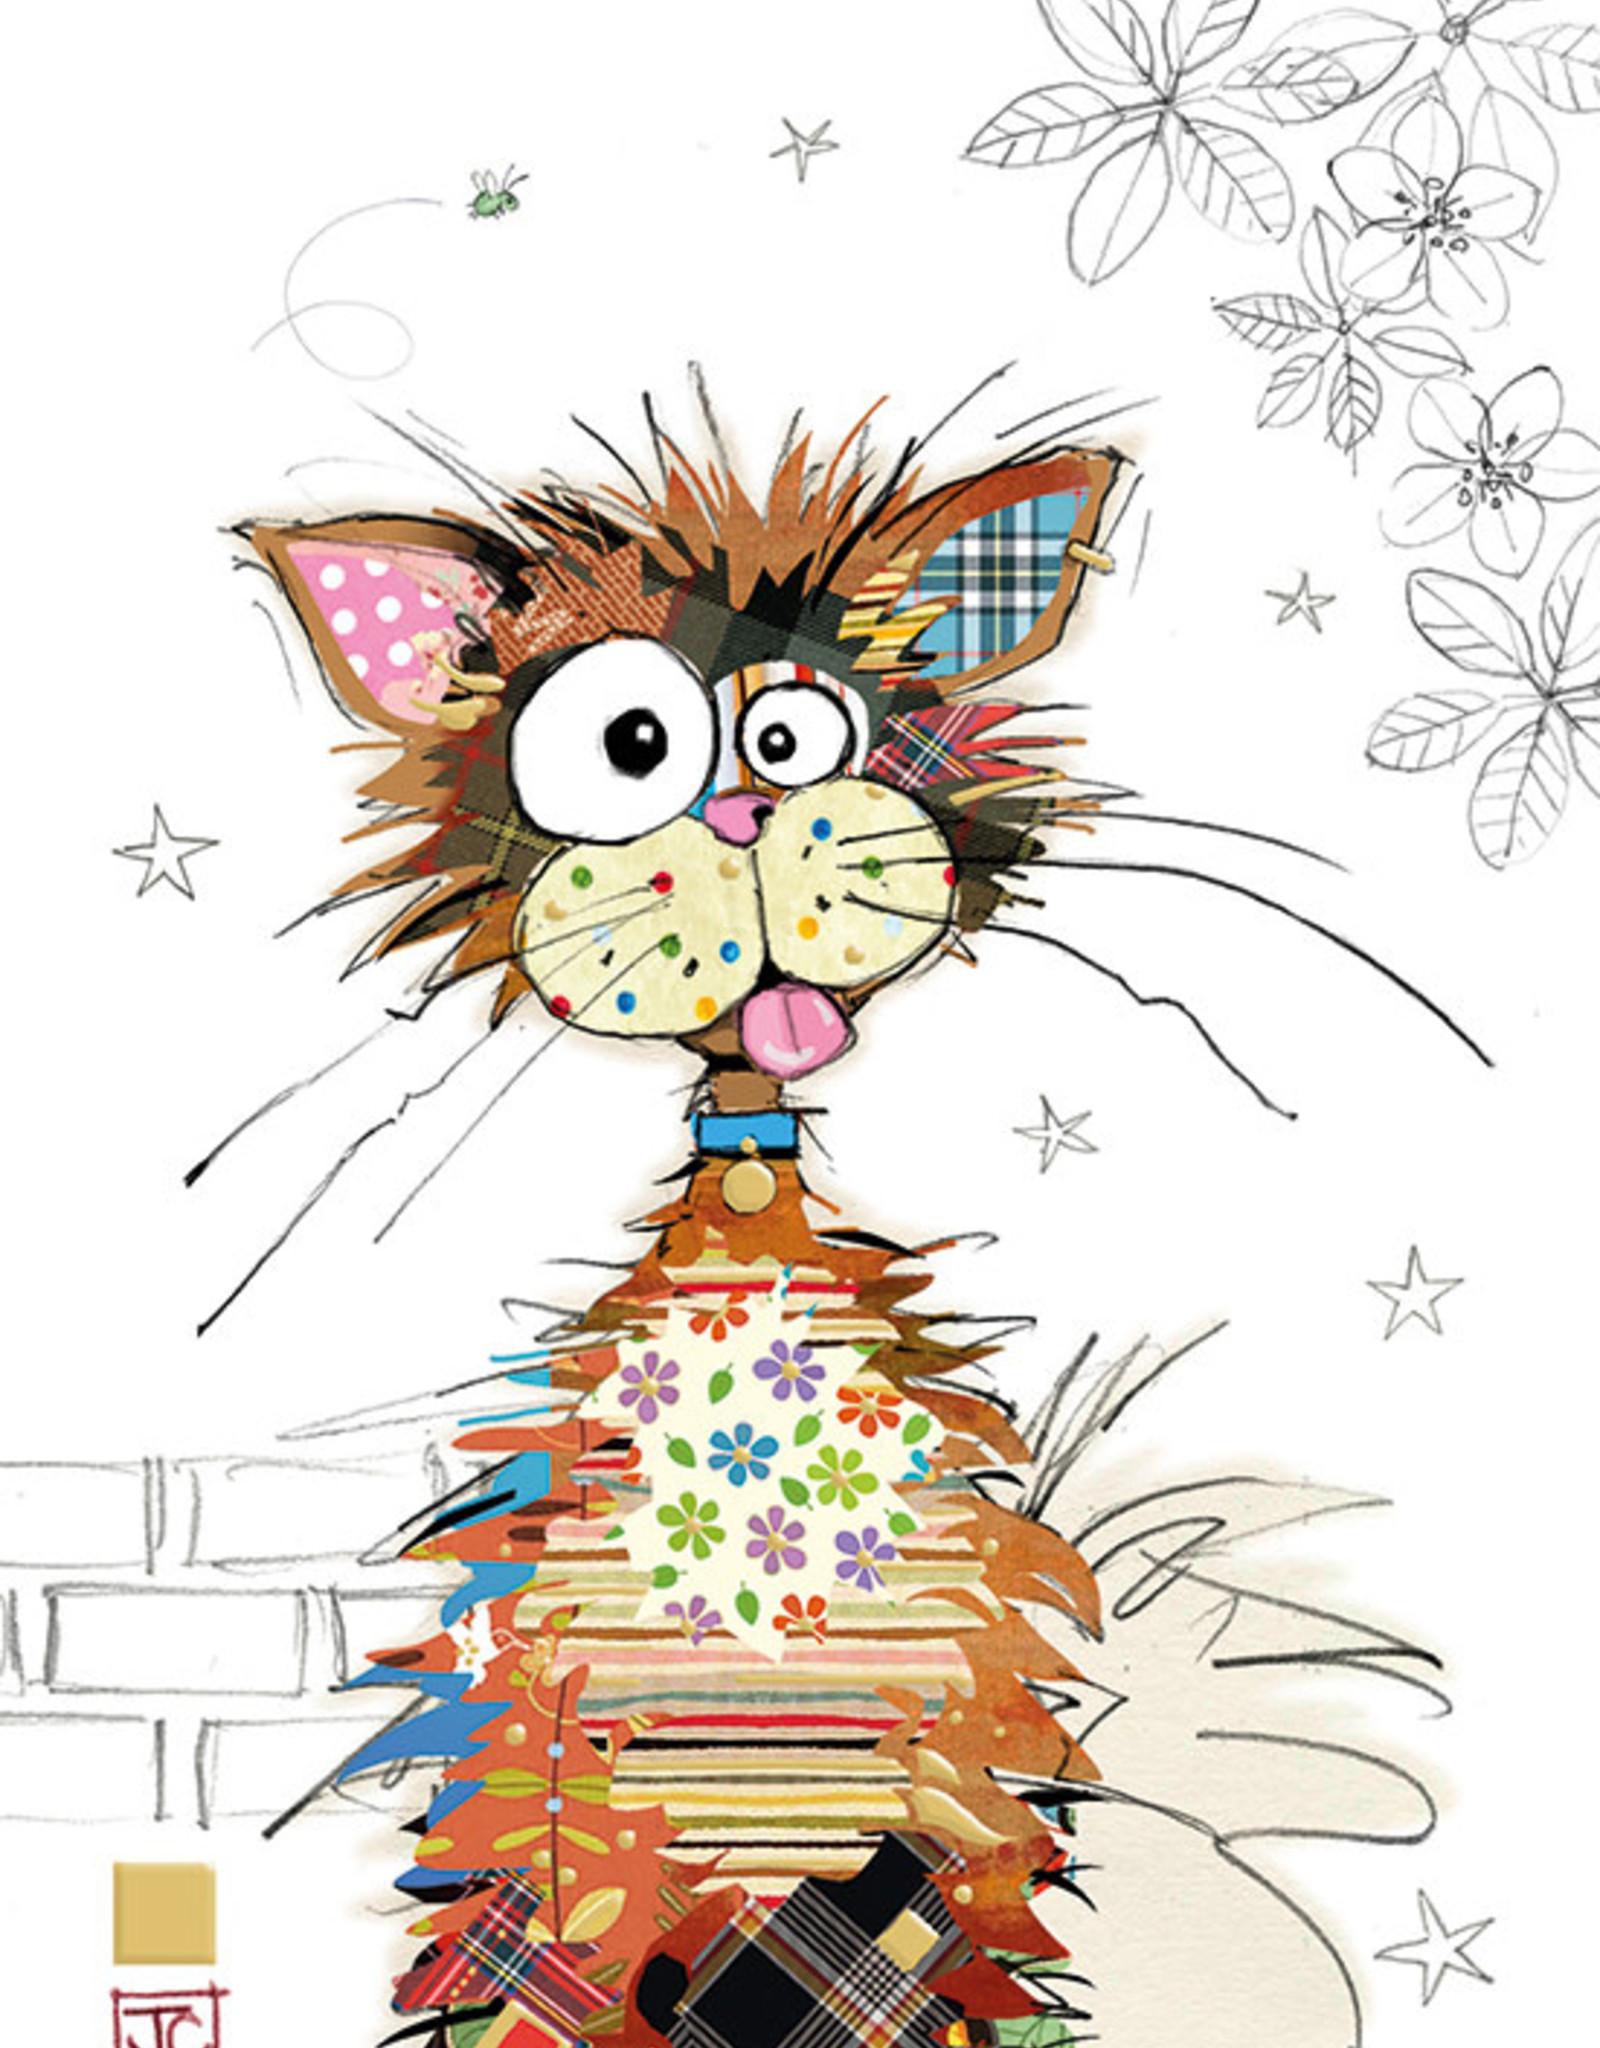 Incognito Card Kooks-Ziggy Cat